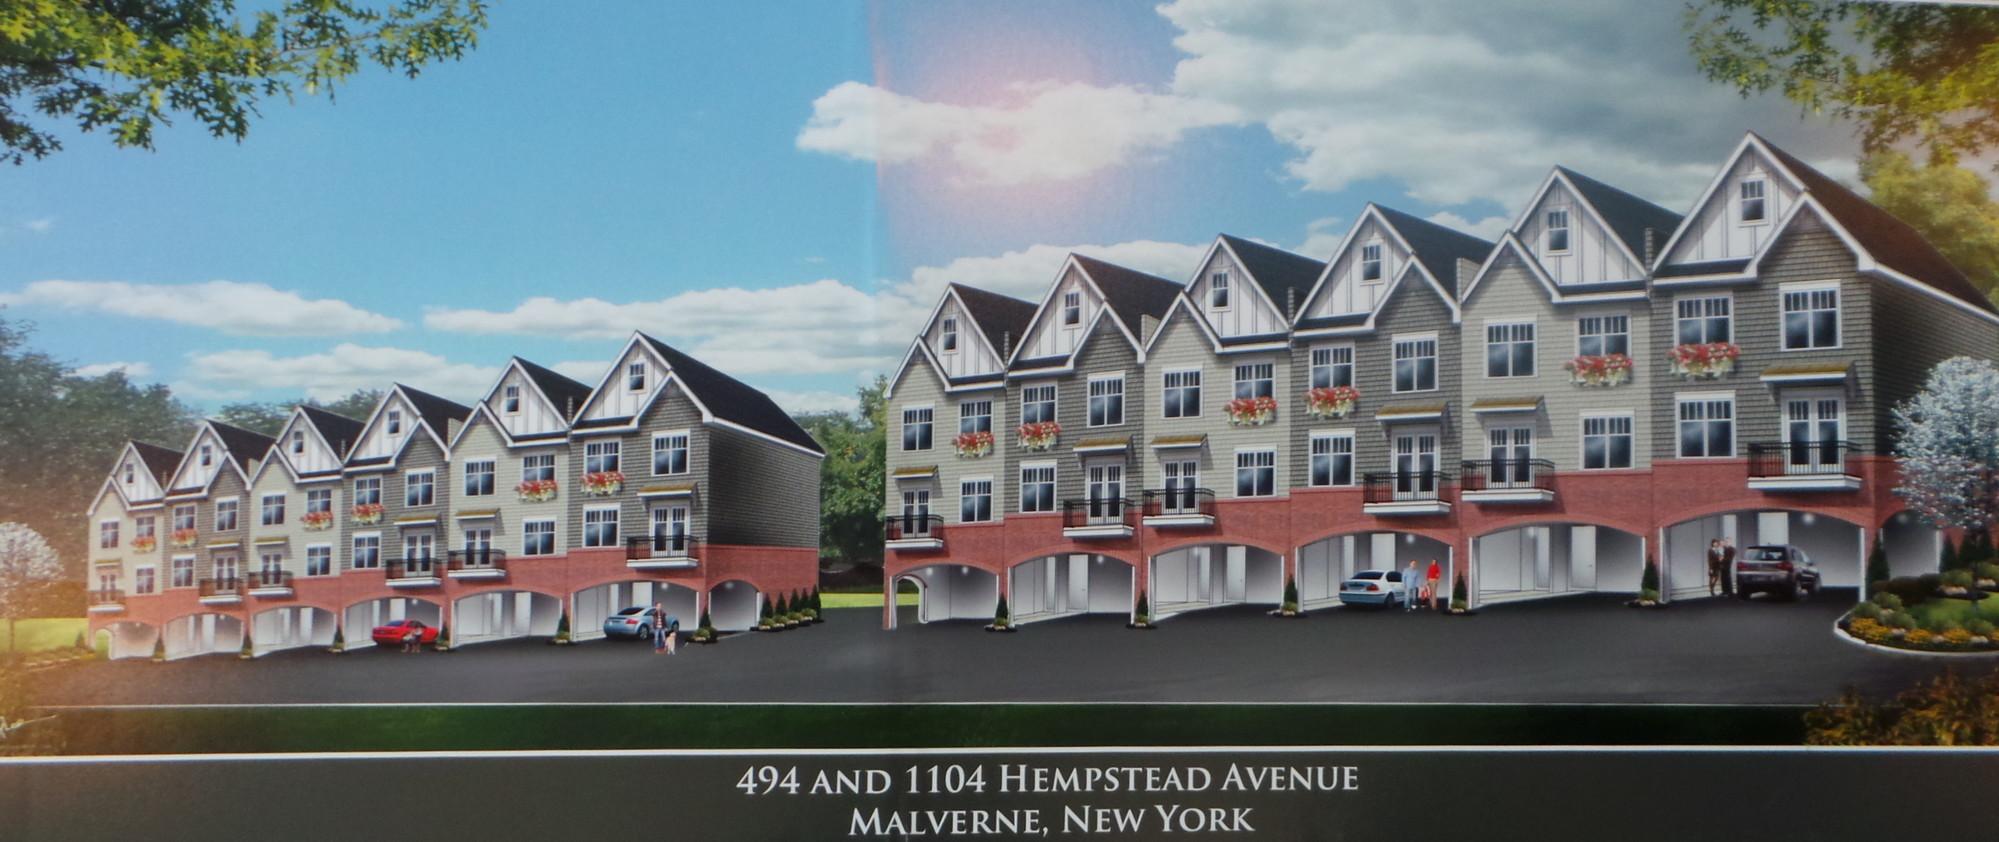 494 and 1104 Hempstead Avenue